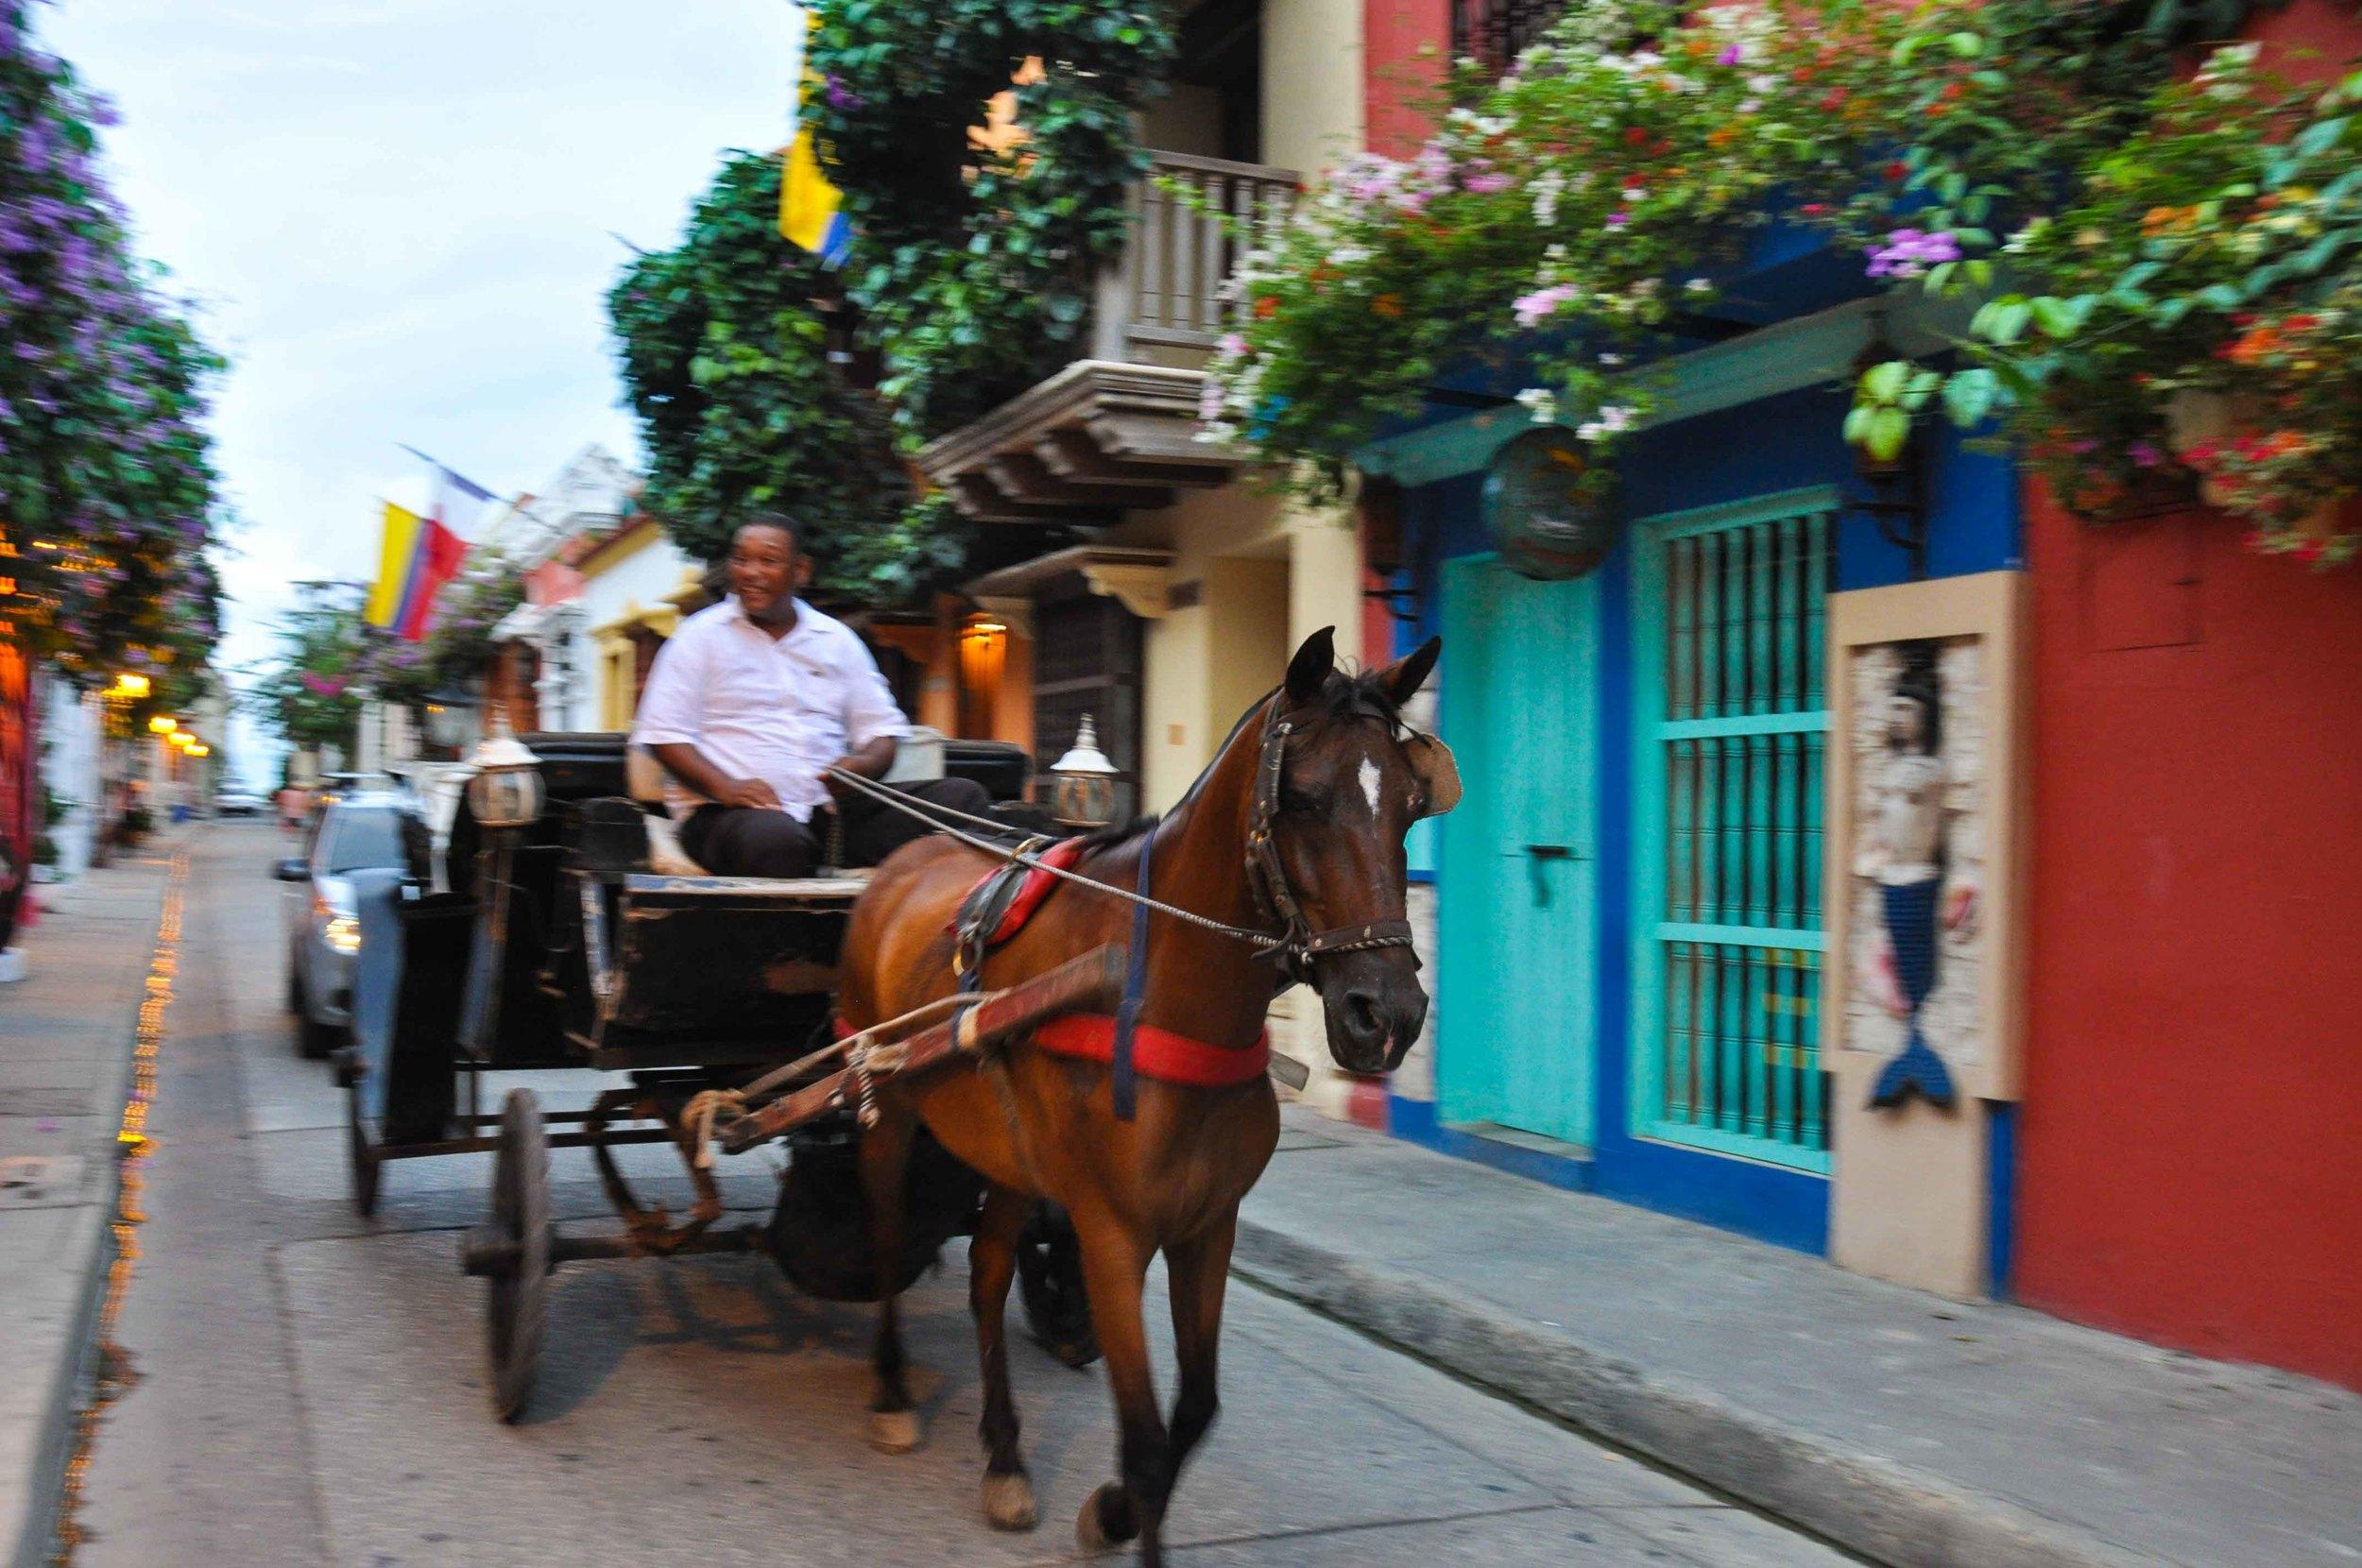 2015_10_Cartagena_s-17.jpg